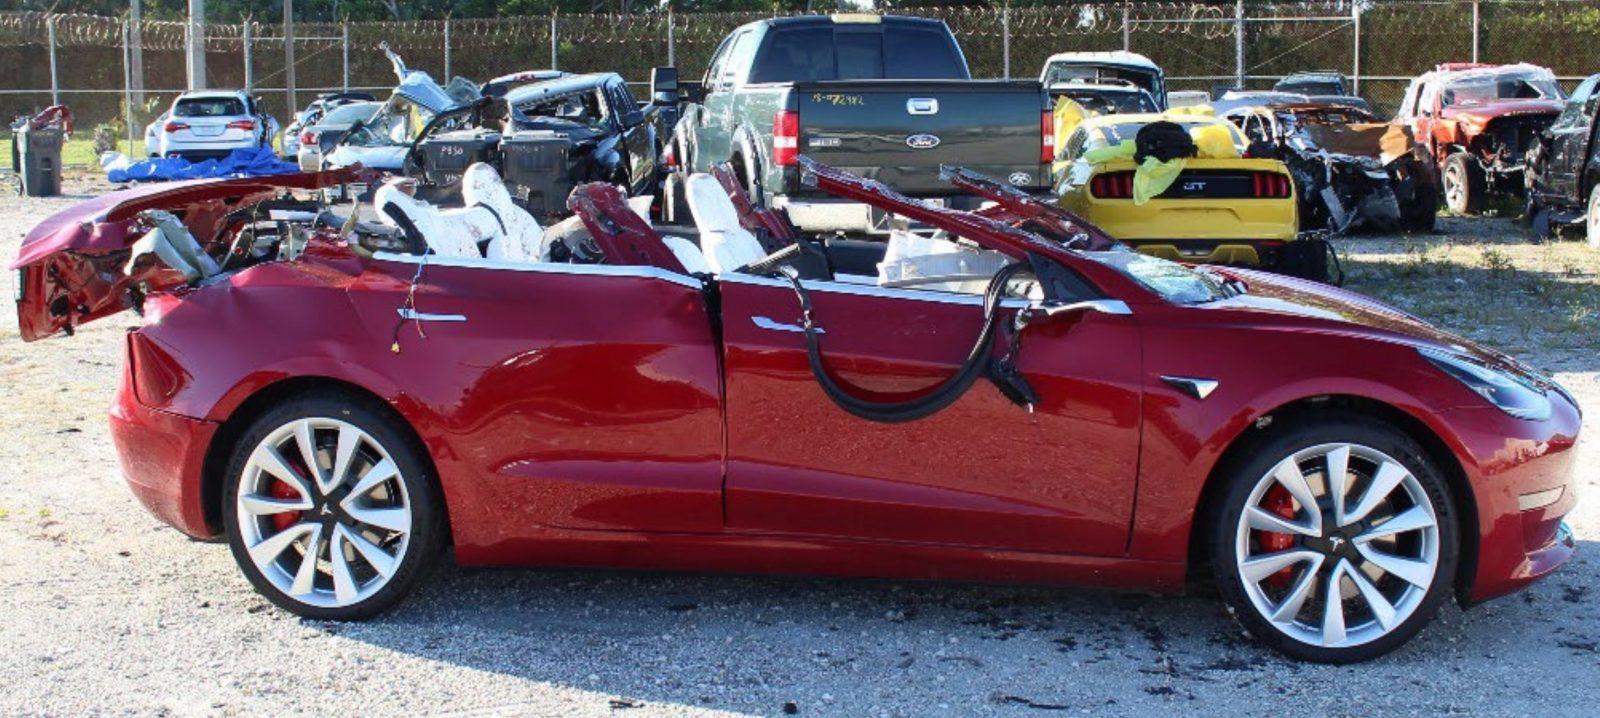 Tesla Autopilot fatal crash with truck is under